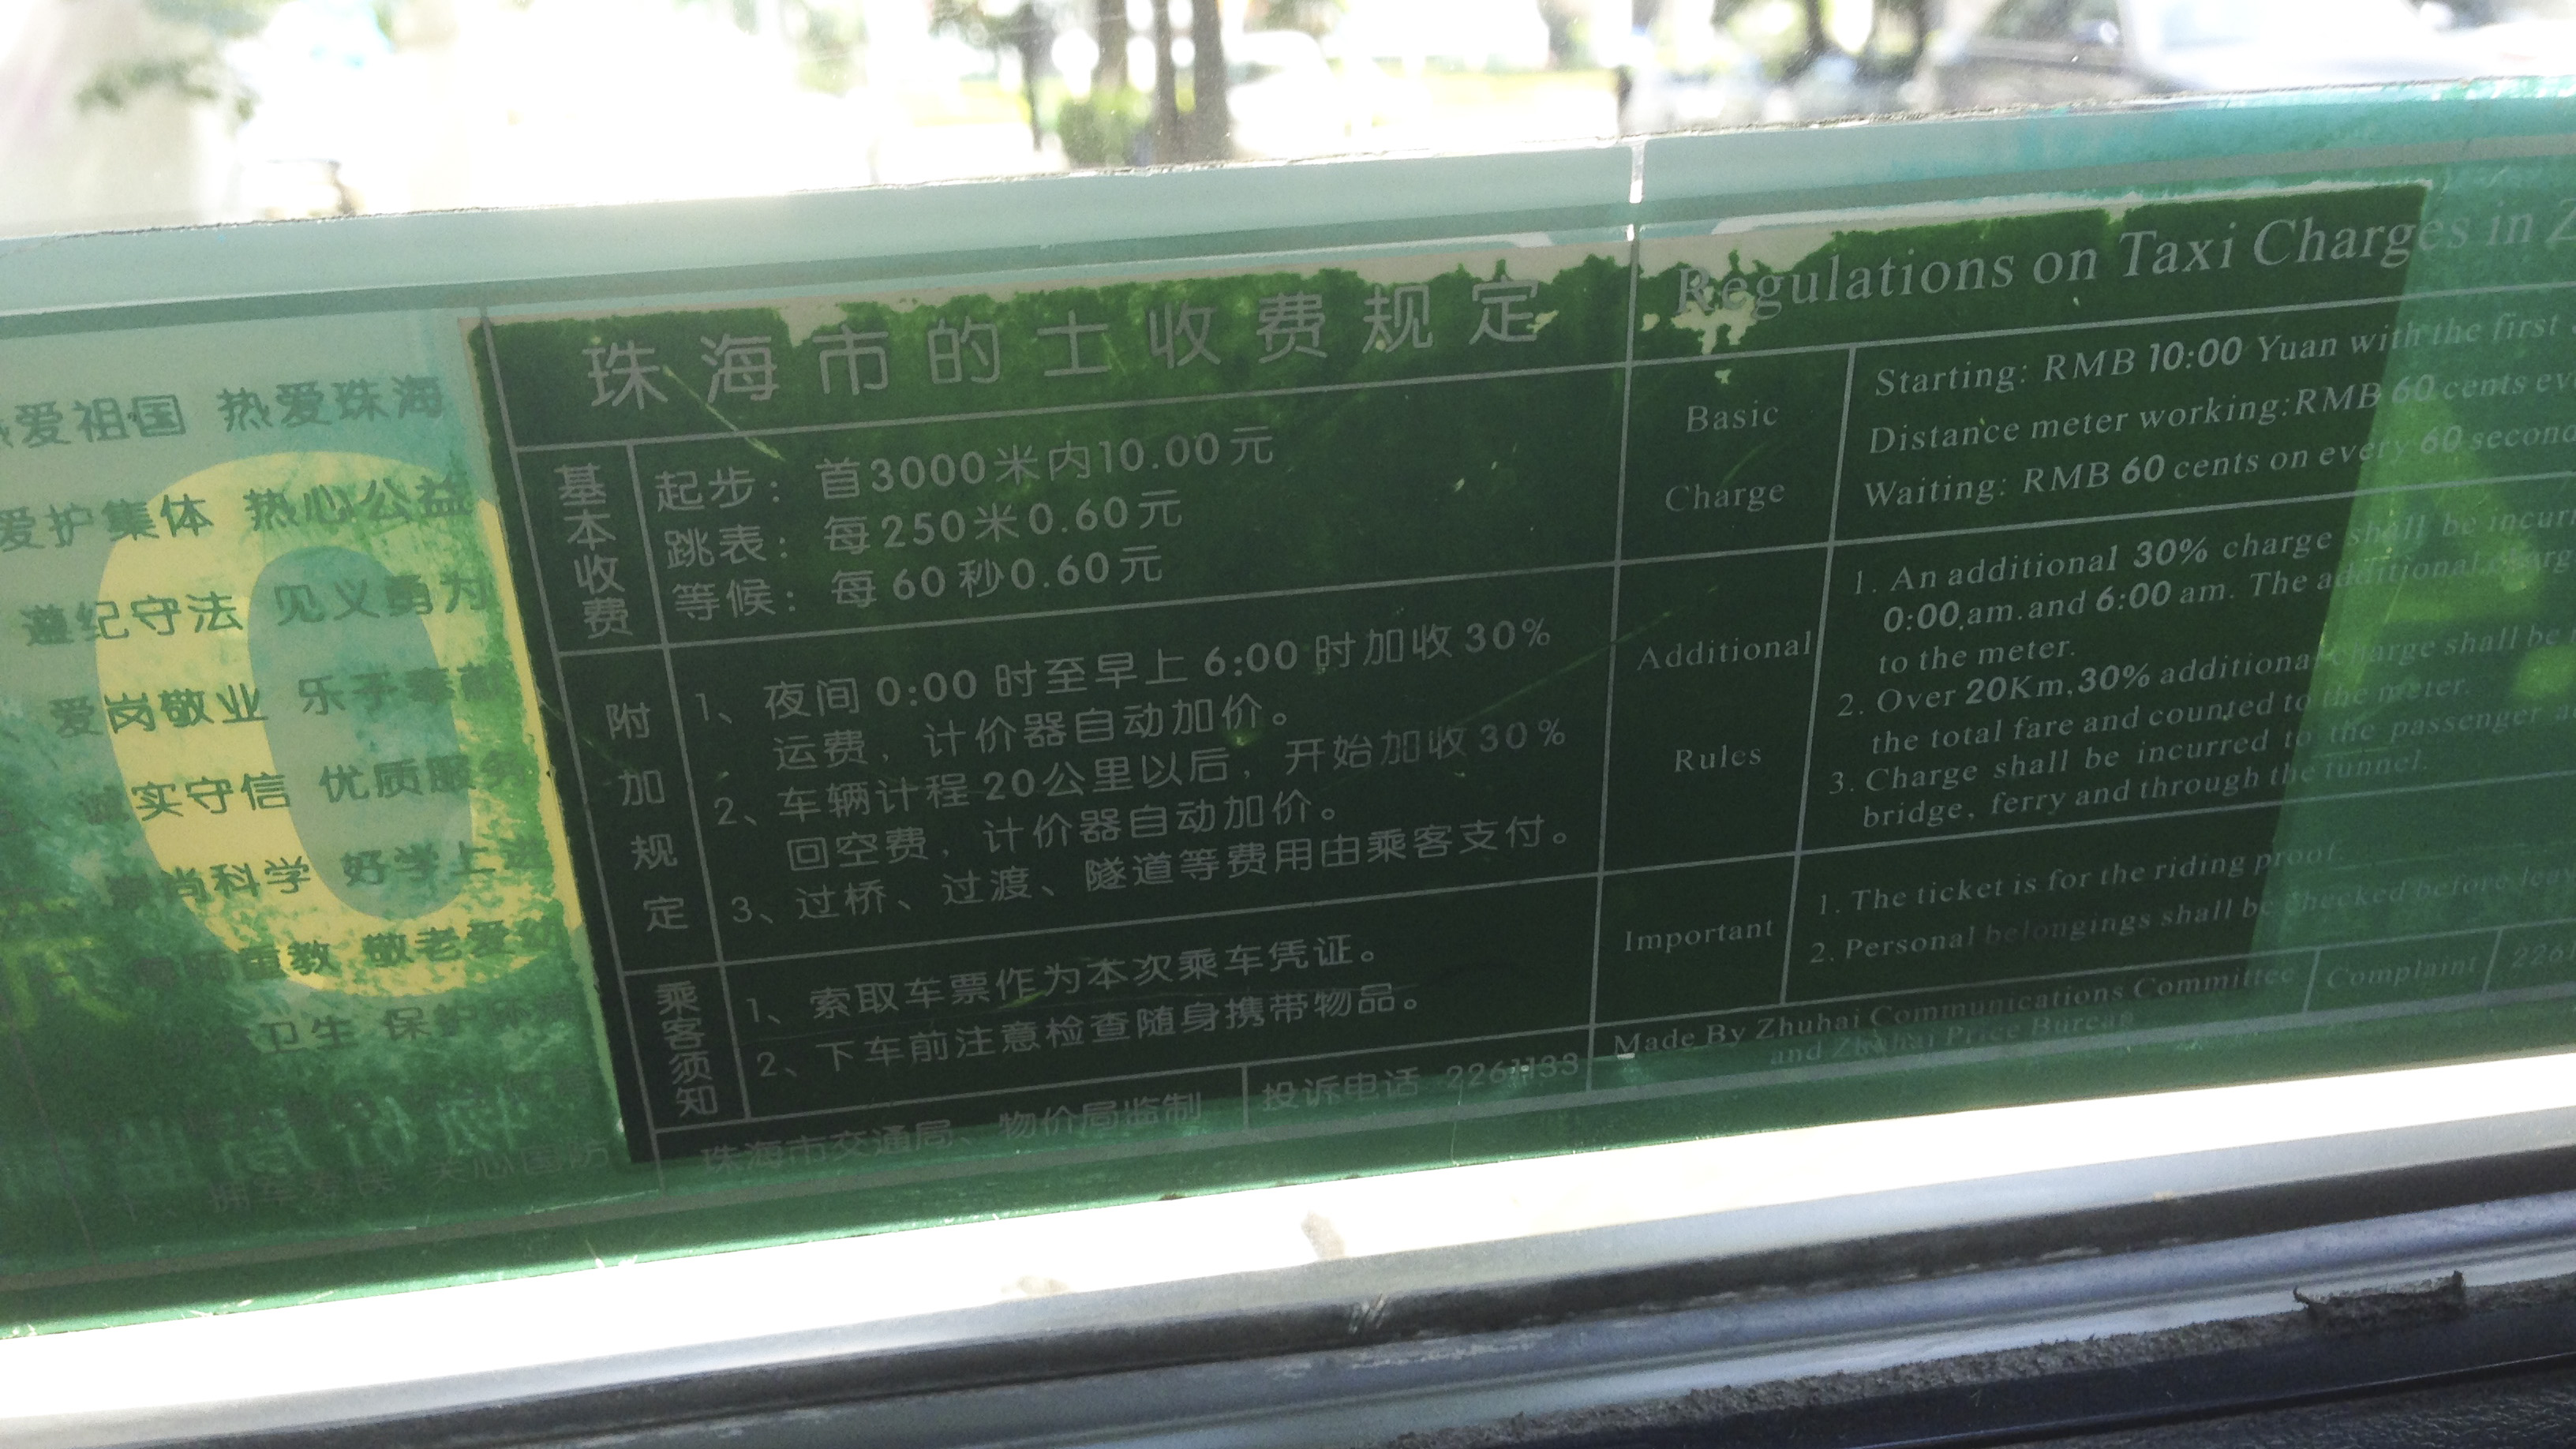 File:Zhuhai Taxi Fare Table jpg - Wikimedia Commons